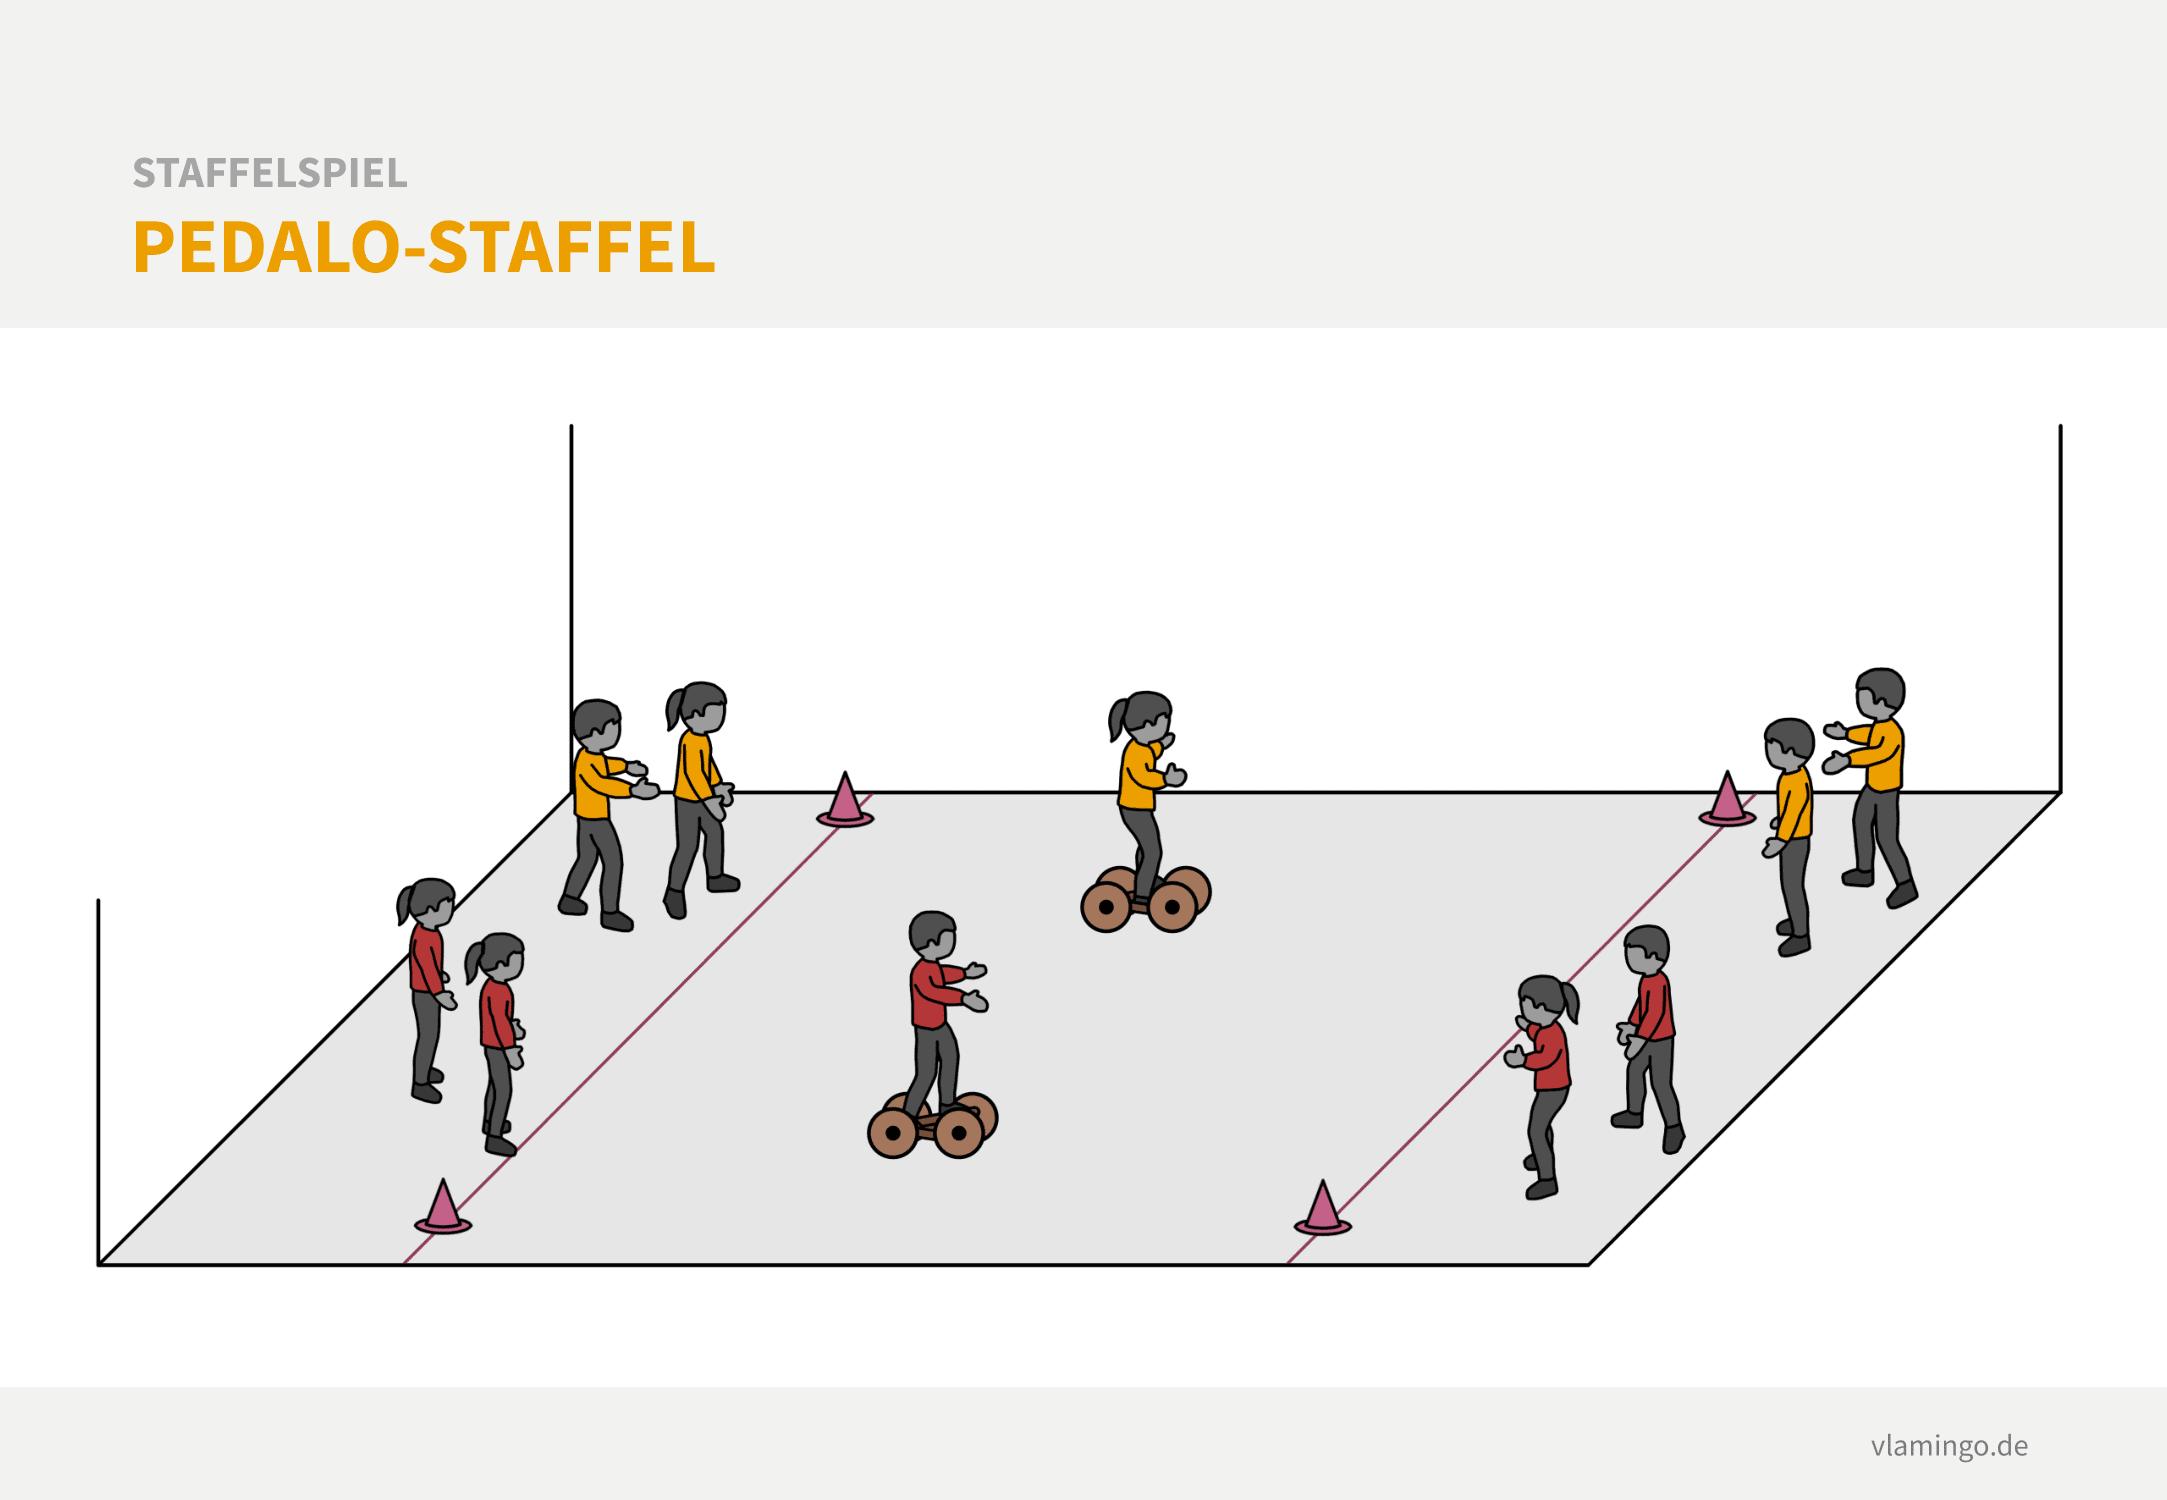 Staffelspiel - Pedalo-Staffel